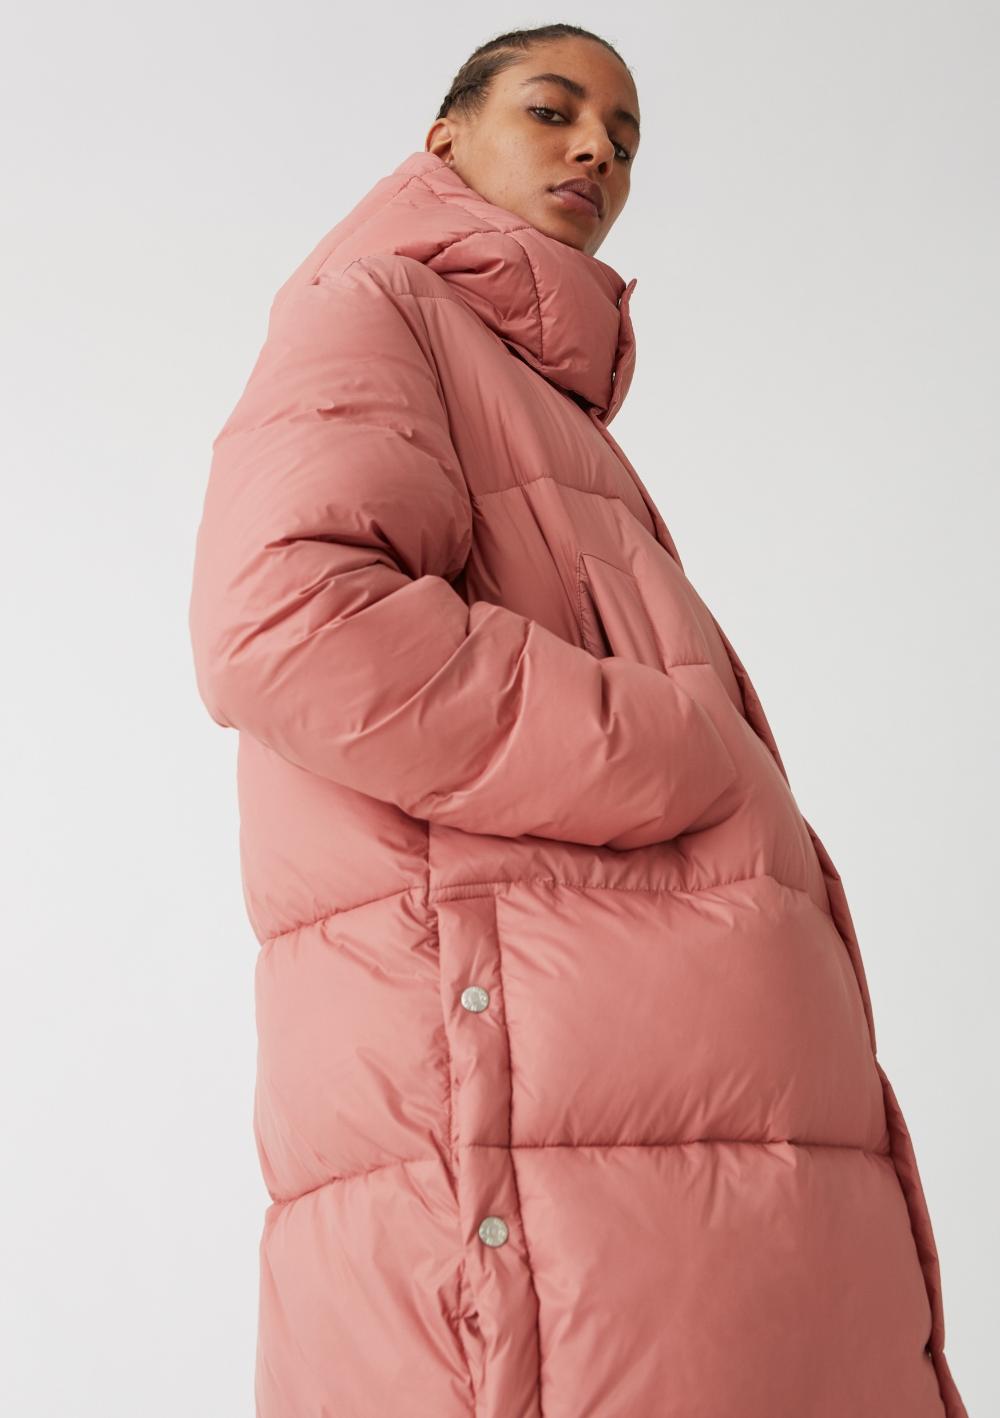 Duvet Coat Pink Coats Jackets Women S Collection Hope Sthlm Duvet Coat Duvet Jacket Coat [ 1418 x 1000 Pixel ]